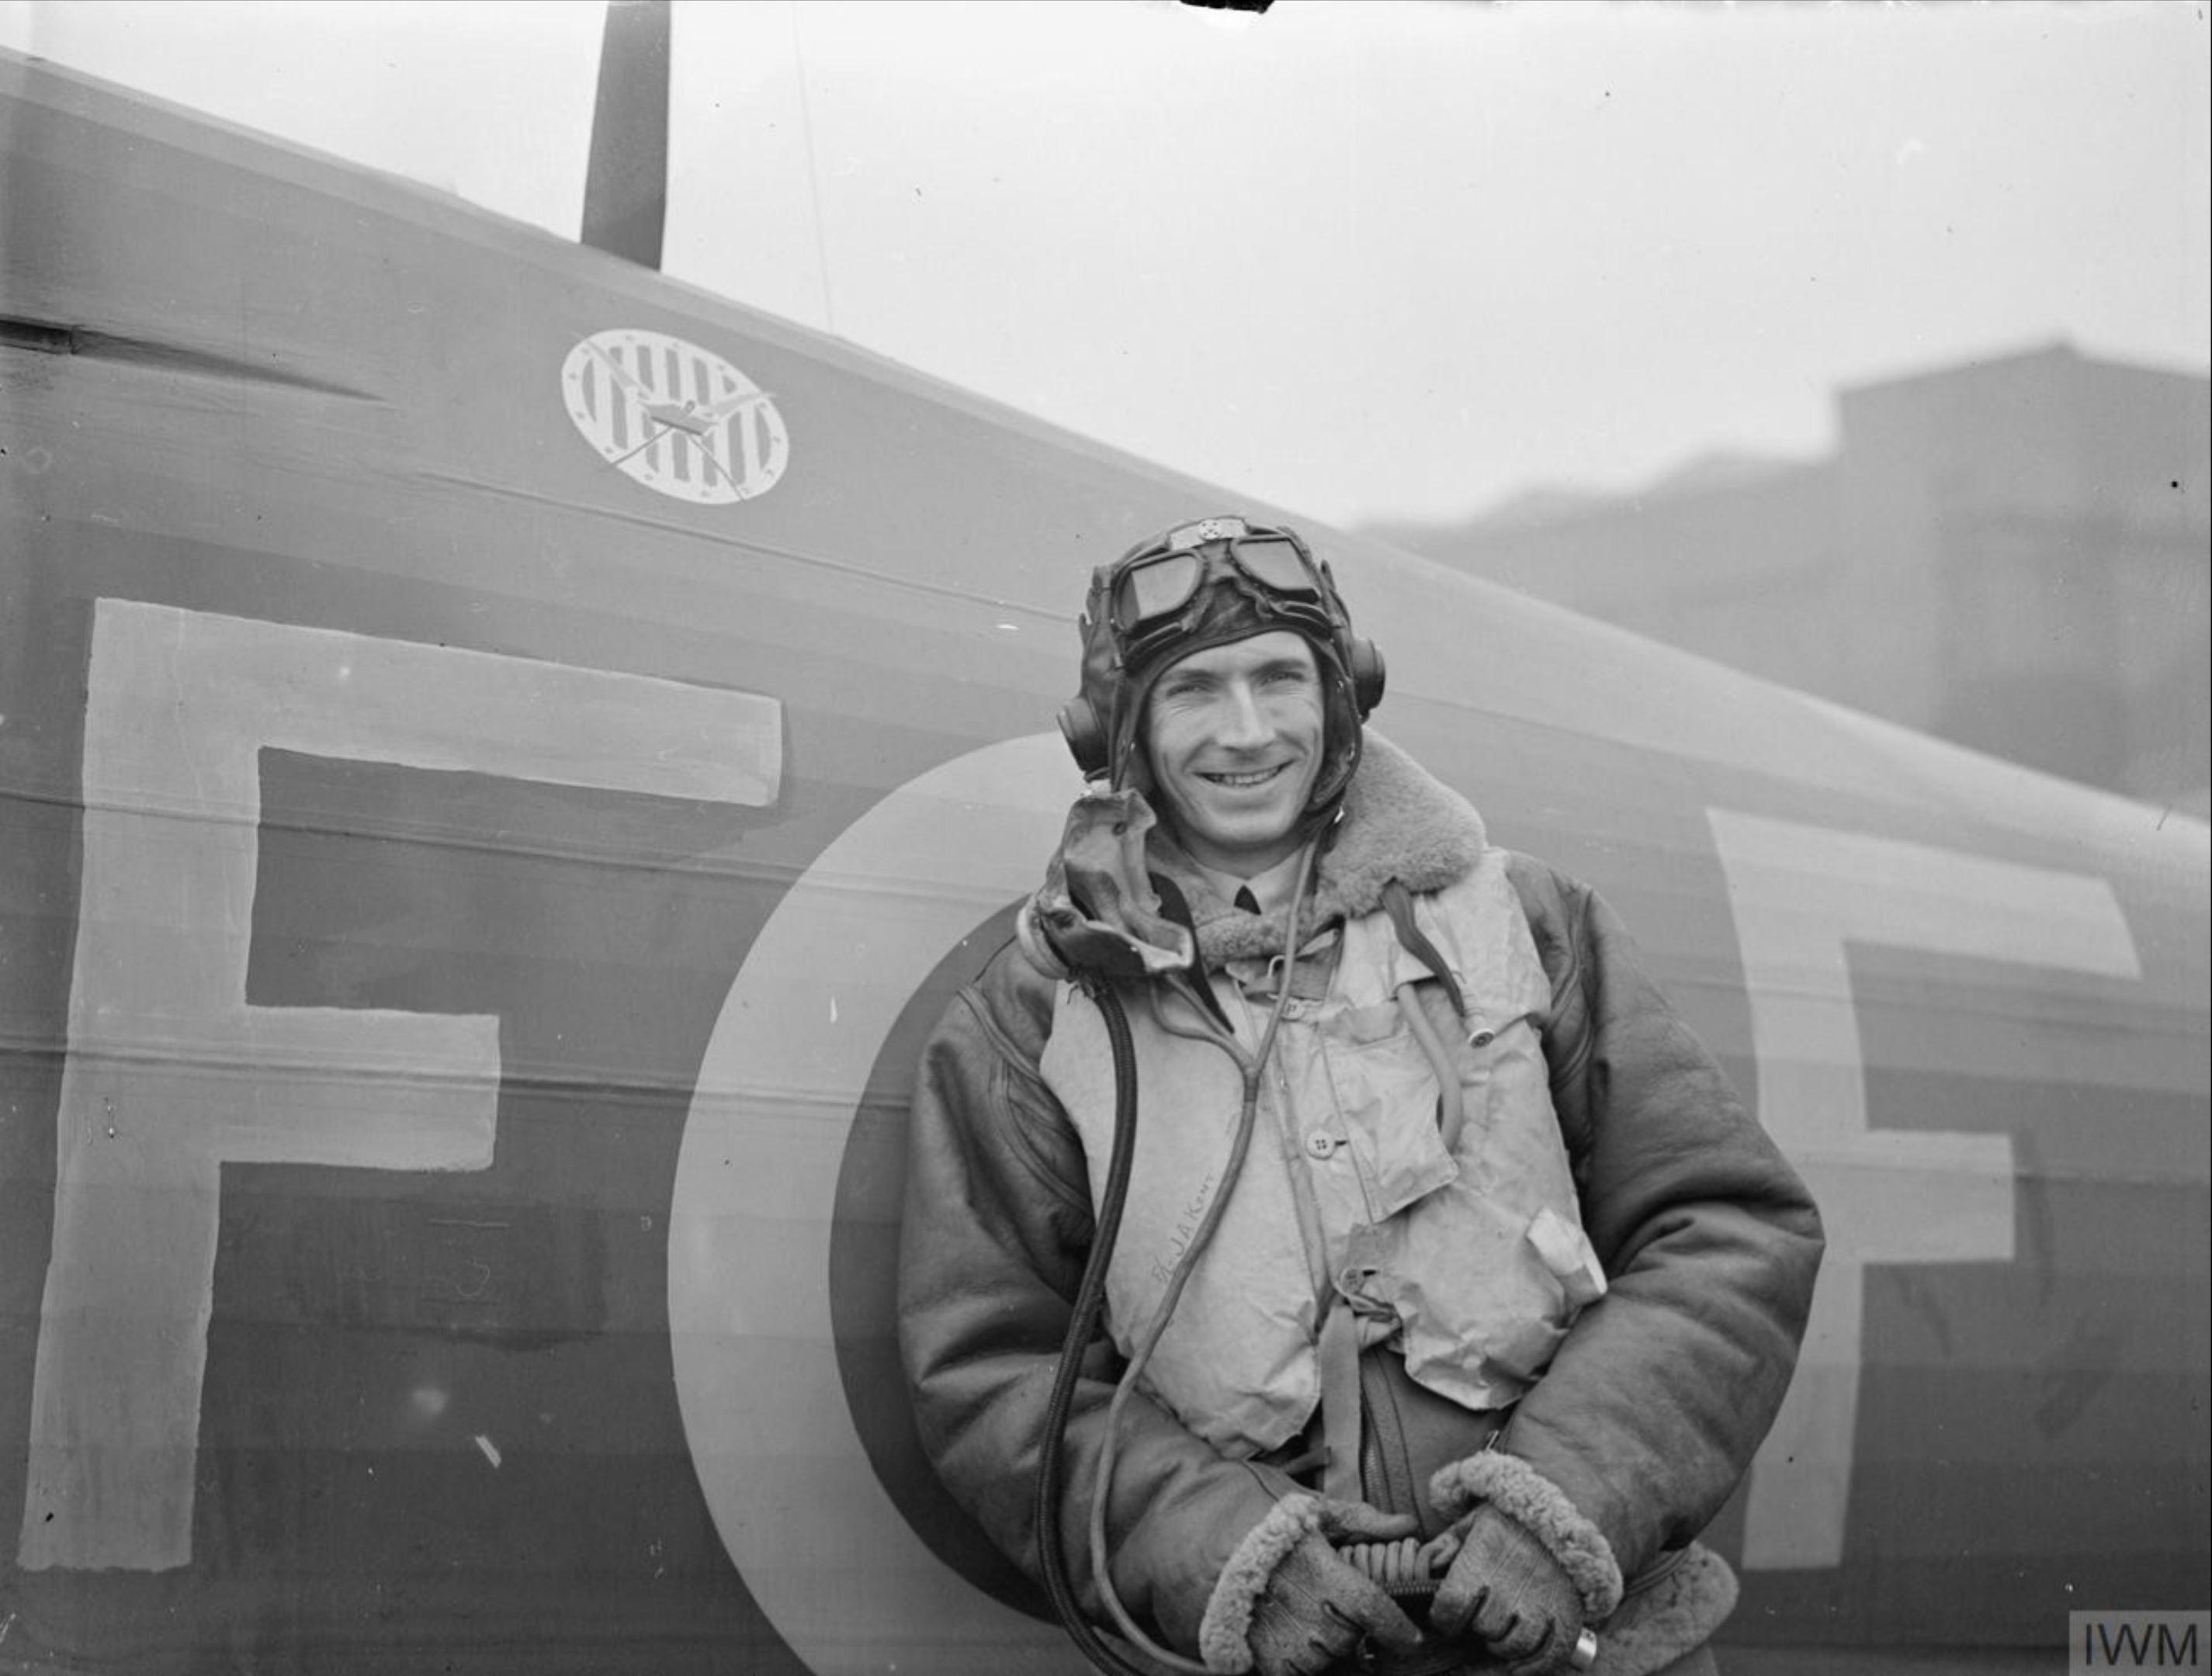 Hurricane I RAF 303Sqn RFF V6684 John A Kent at RAF Leconfield 24 Oct 1940 IWM CH1530